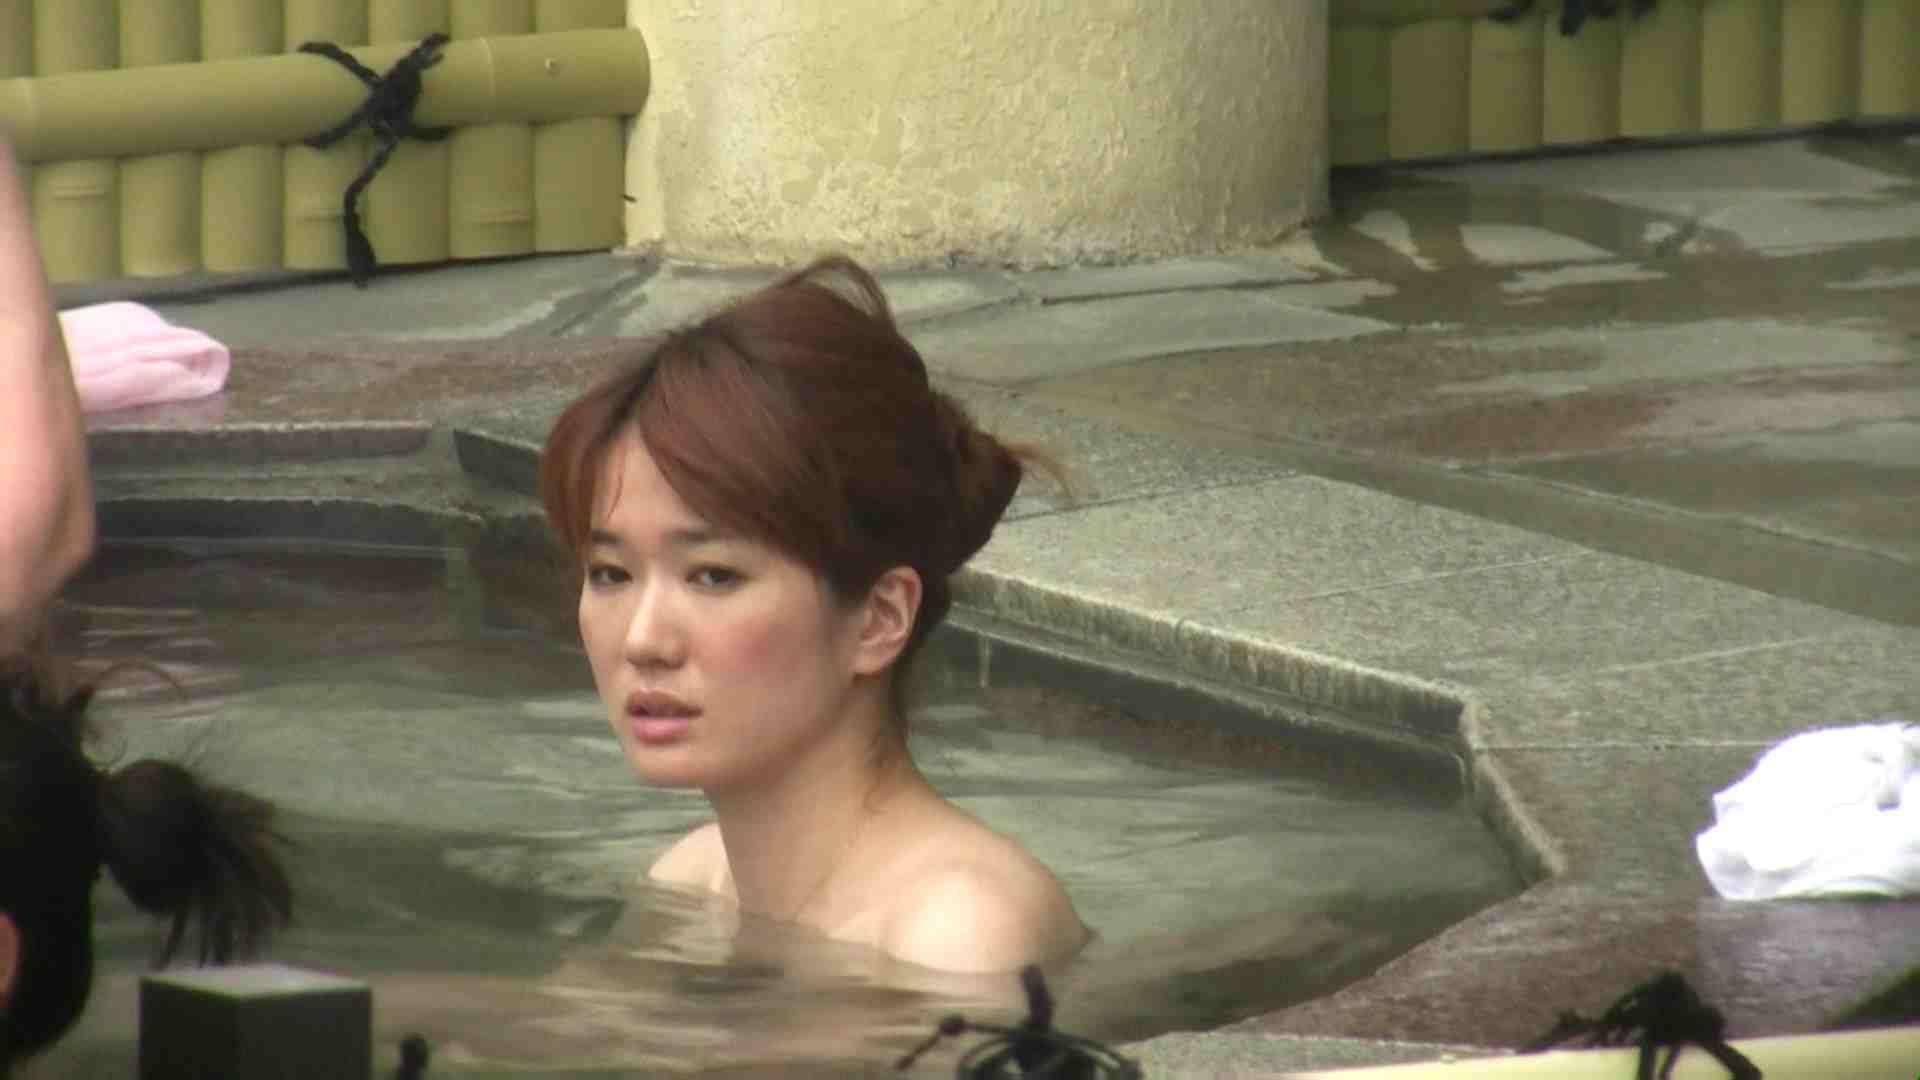 Aquaな露天風呂Vol.110 エッチな盗撮 のぞき動画キャプチャ 89pic 3